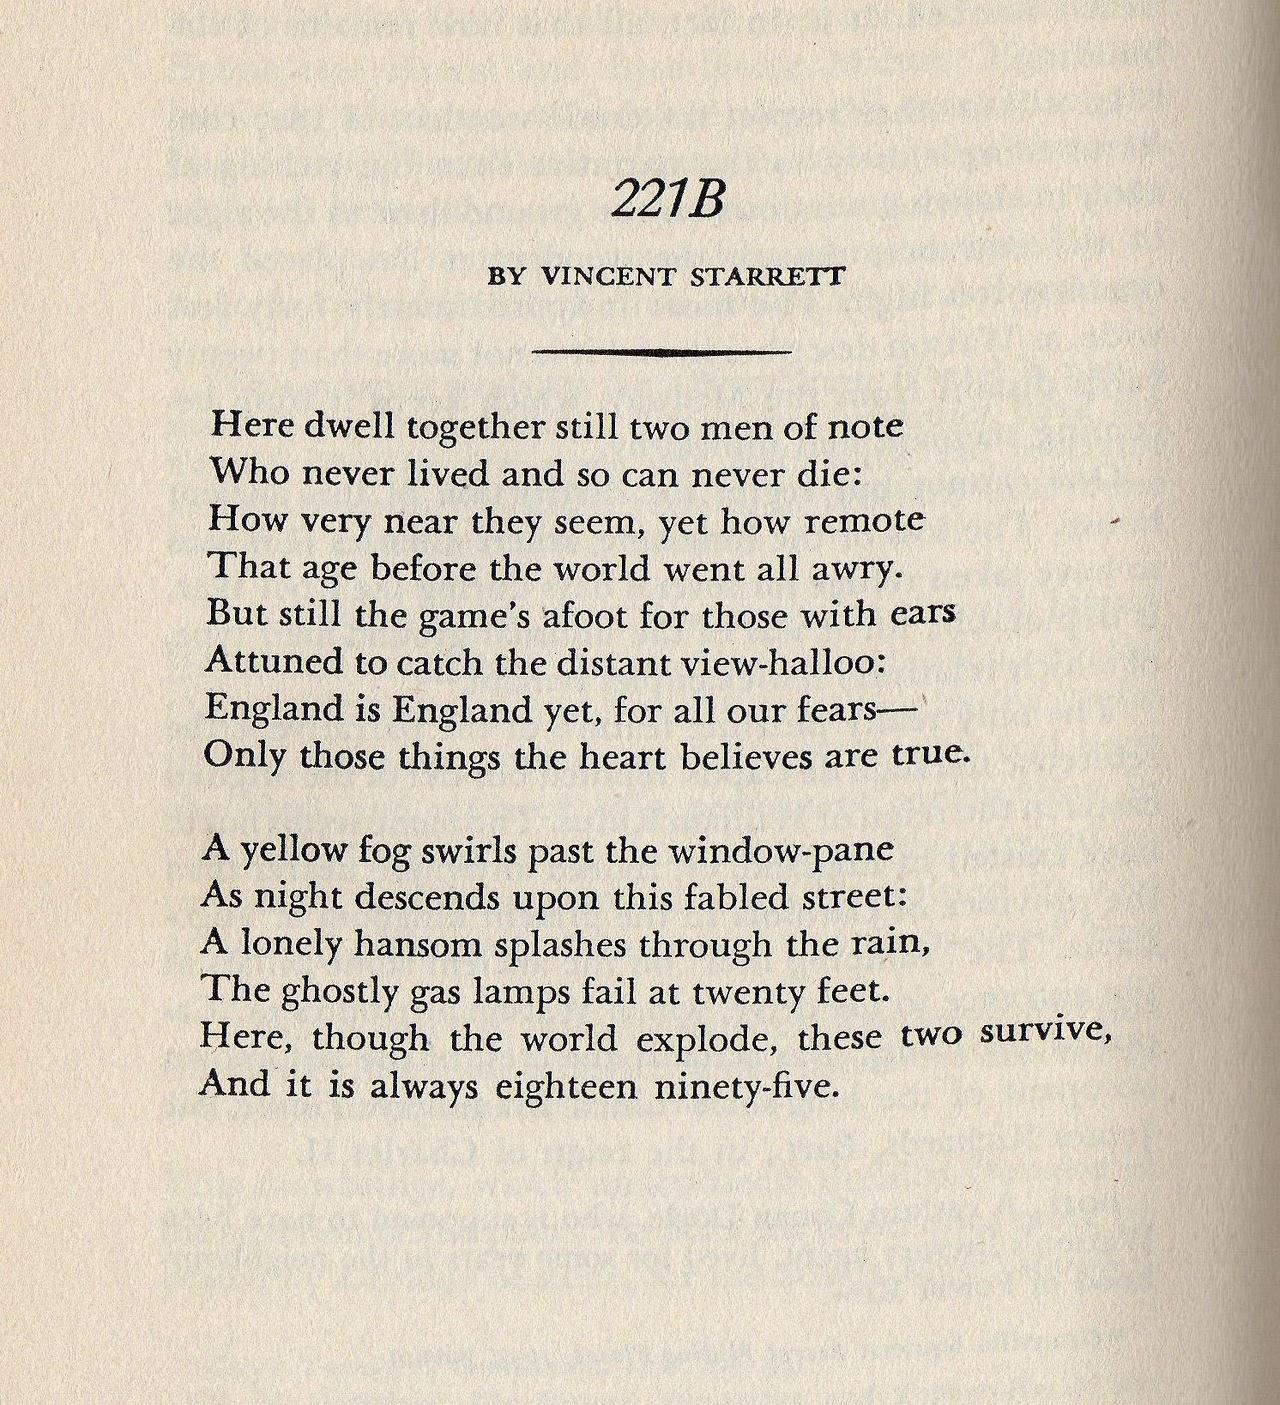 "Vincent Starrett's classic ""221B"" poem"